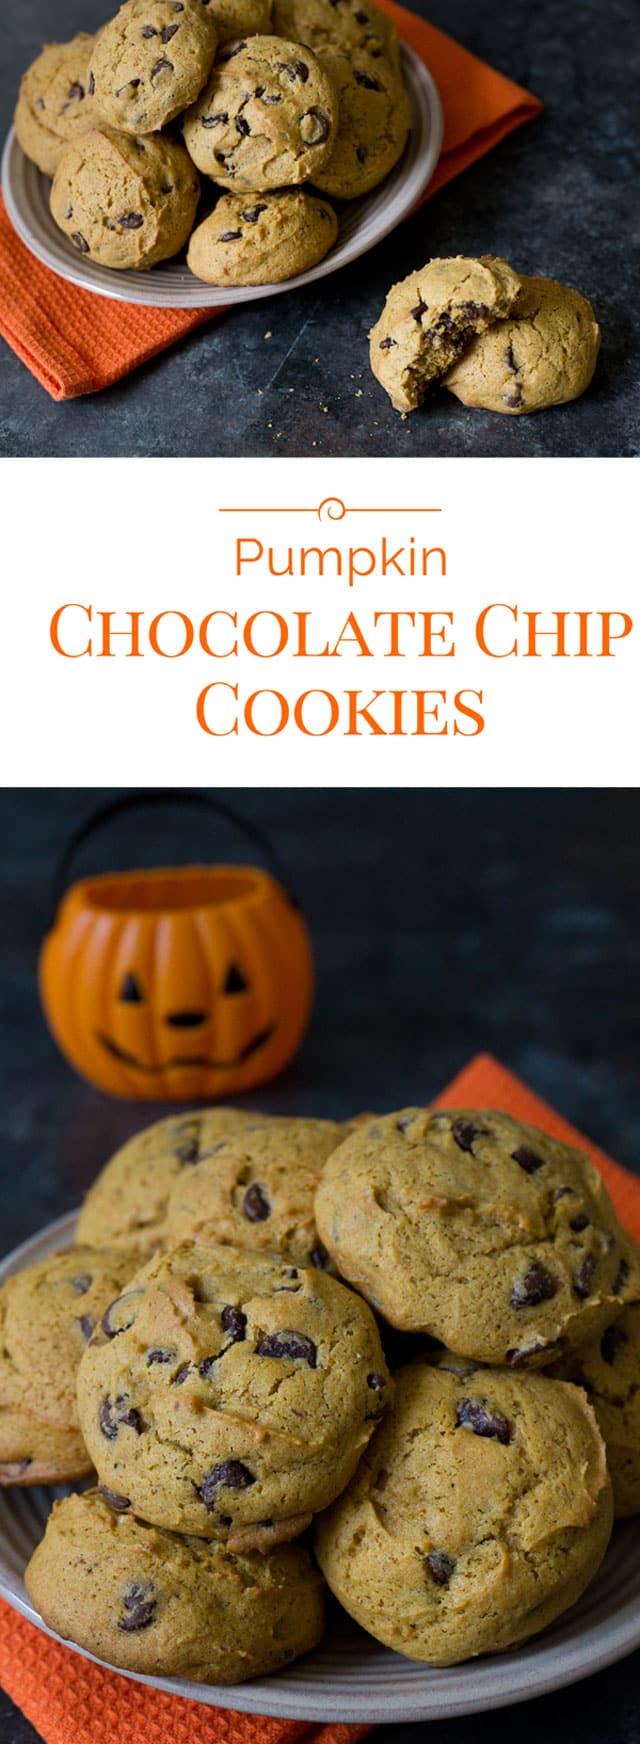 Pumpkin-Chocolate-Chip-Cookies-Collage-Barbara-Bakes